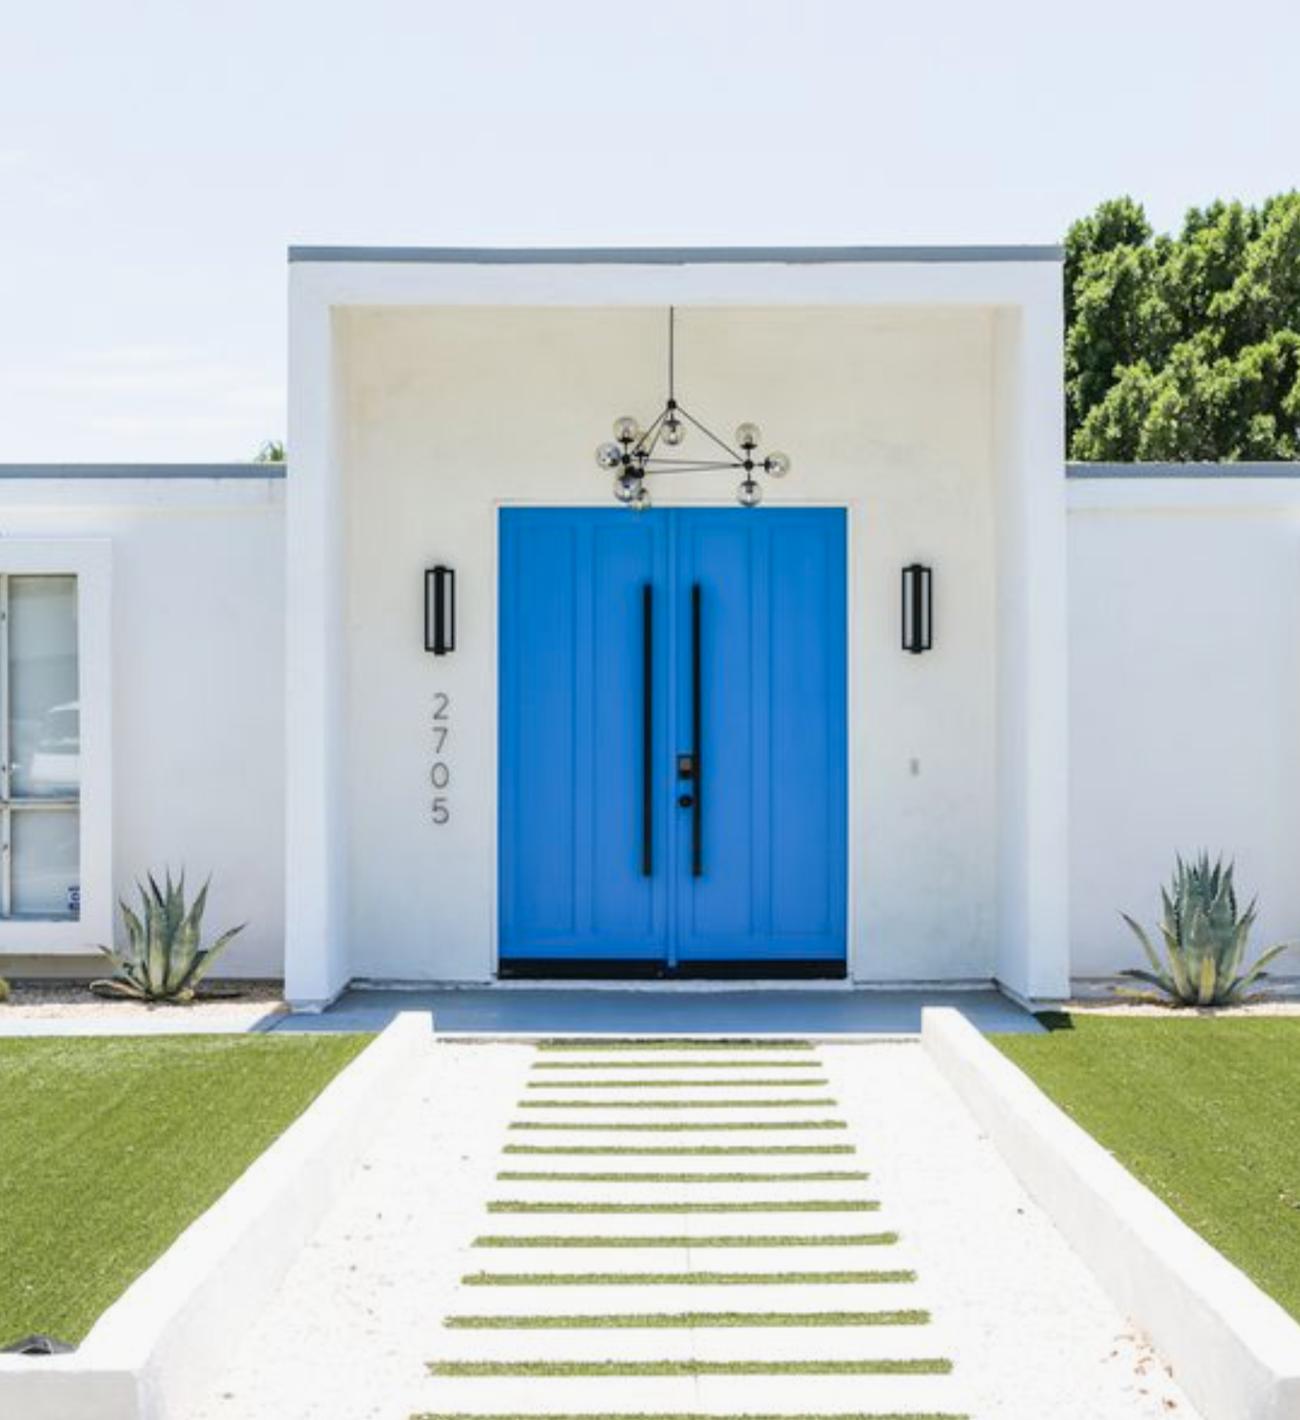 Also, our#2 Clearest Ocean Blue Benjamin Moore 2064-40 Florida Front Door Color is blue like the purest ocean water.